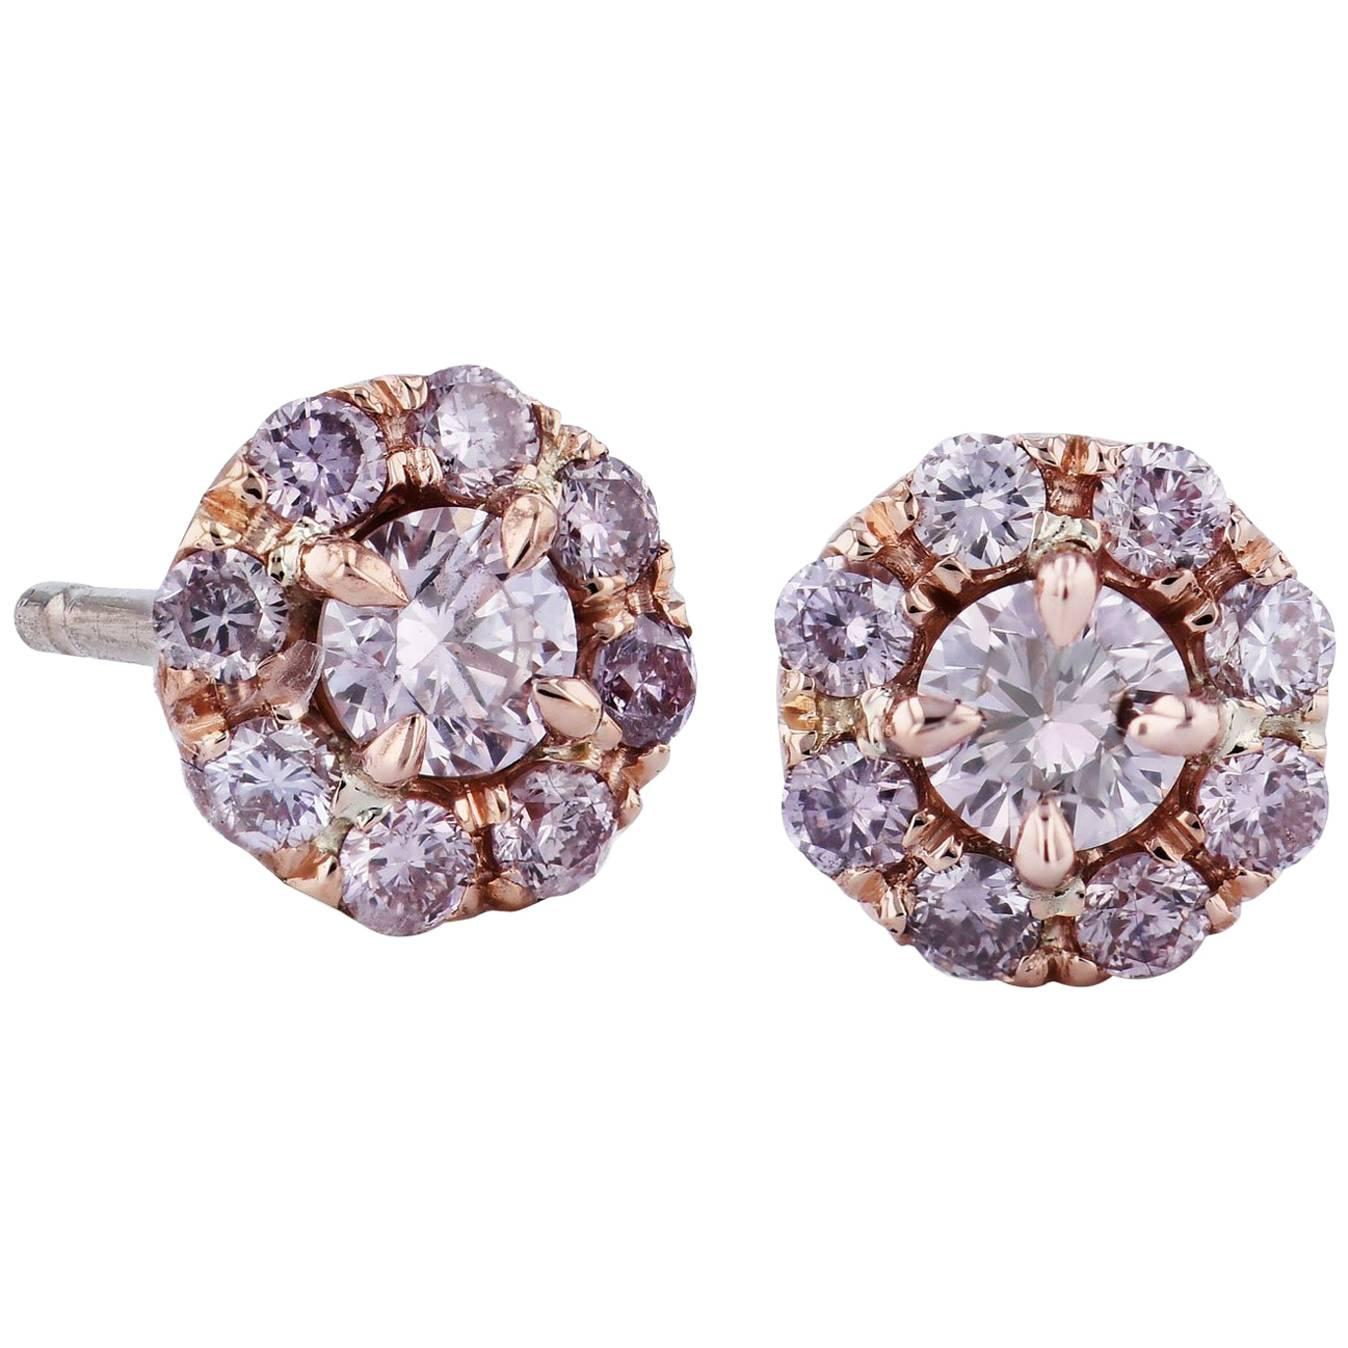 H&H 0.60 Carat Natural Pink Diamond Rose Gold Stud Earrings